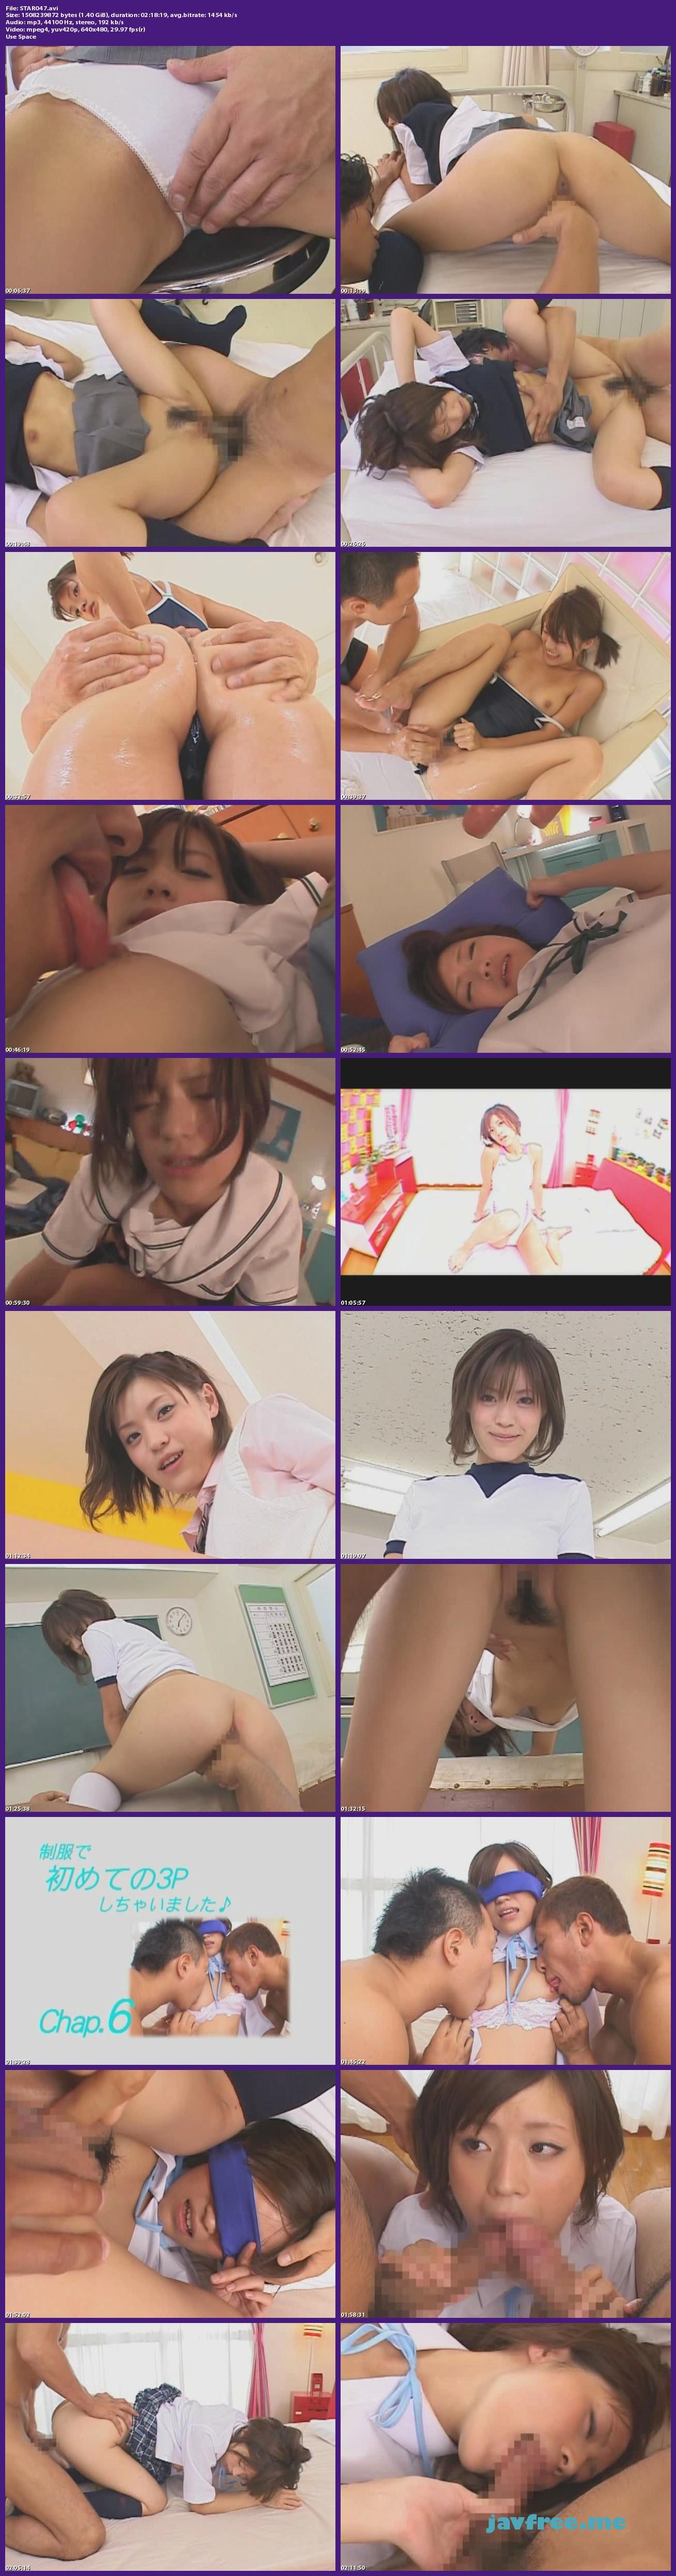 [STAR 047] 芸能人 板垣あずさ 元制○コレクション 学園コスプレ 板垣あずさ STAR